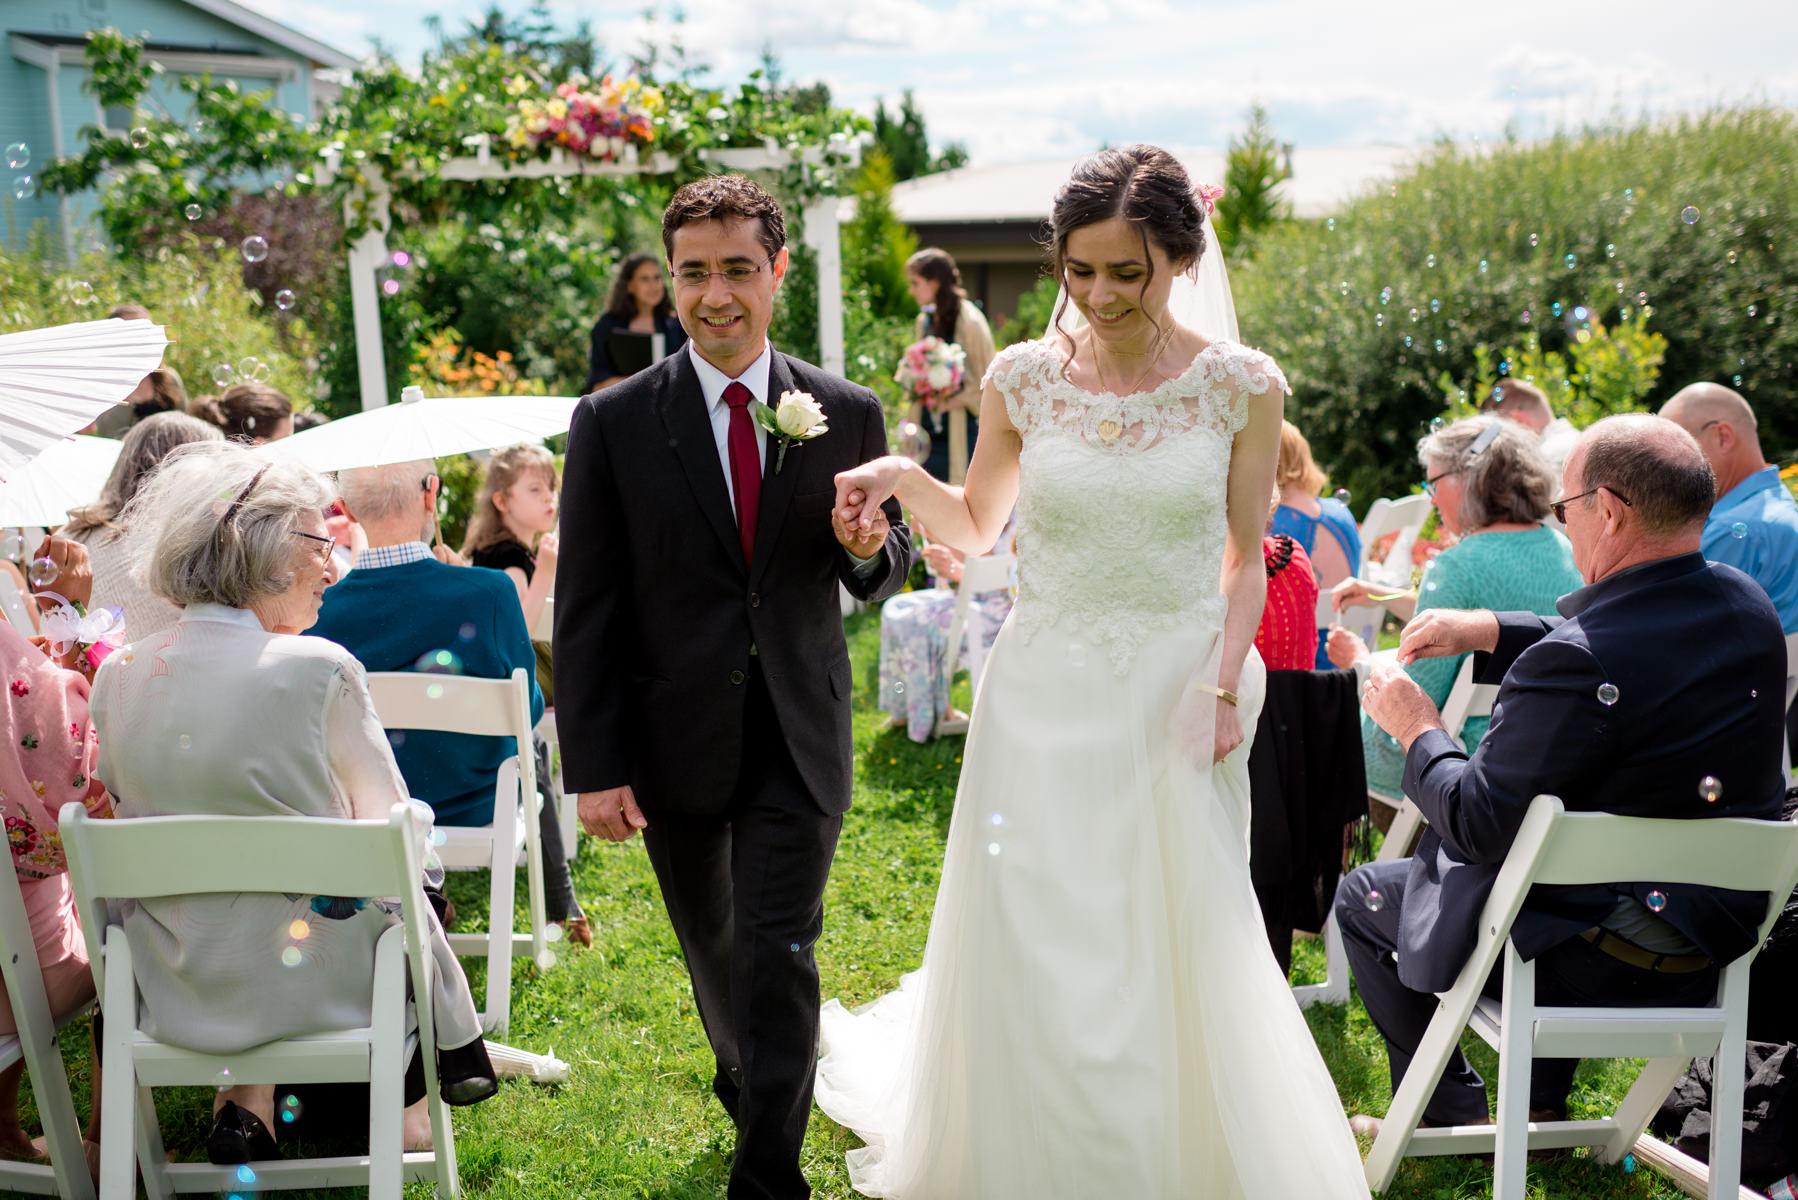 Andrew Tat - Documentary Wedding Photography - Kirkland, Washington - Emily & Cuauh - 19.JPG